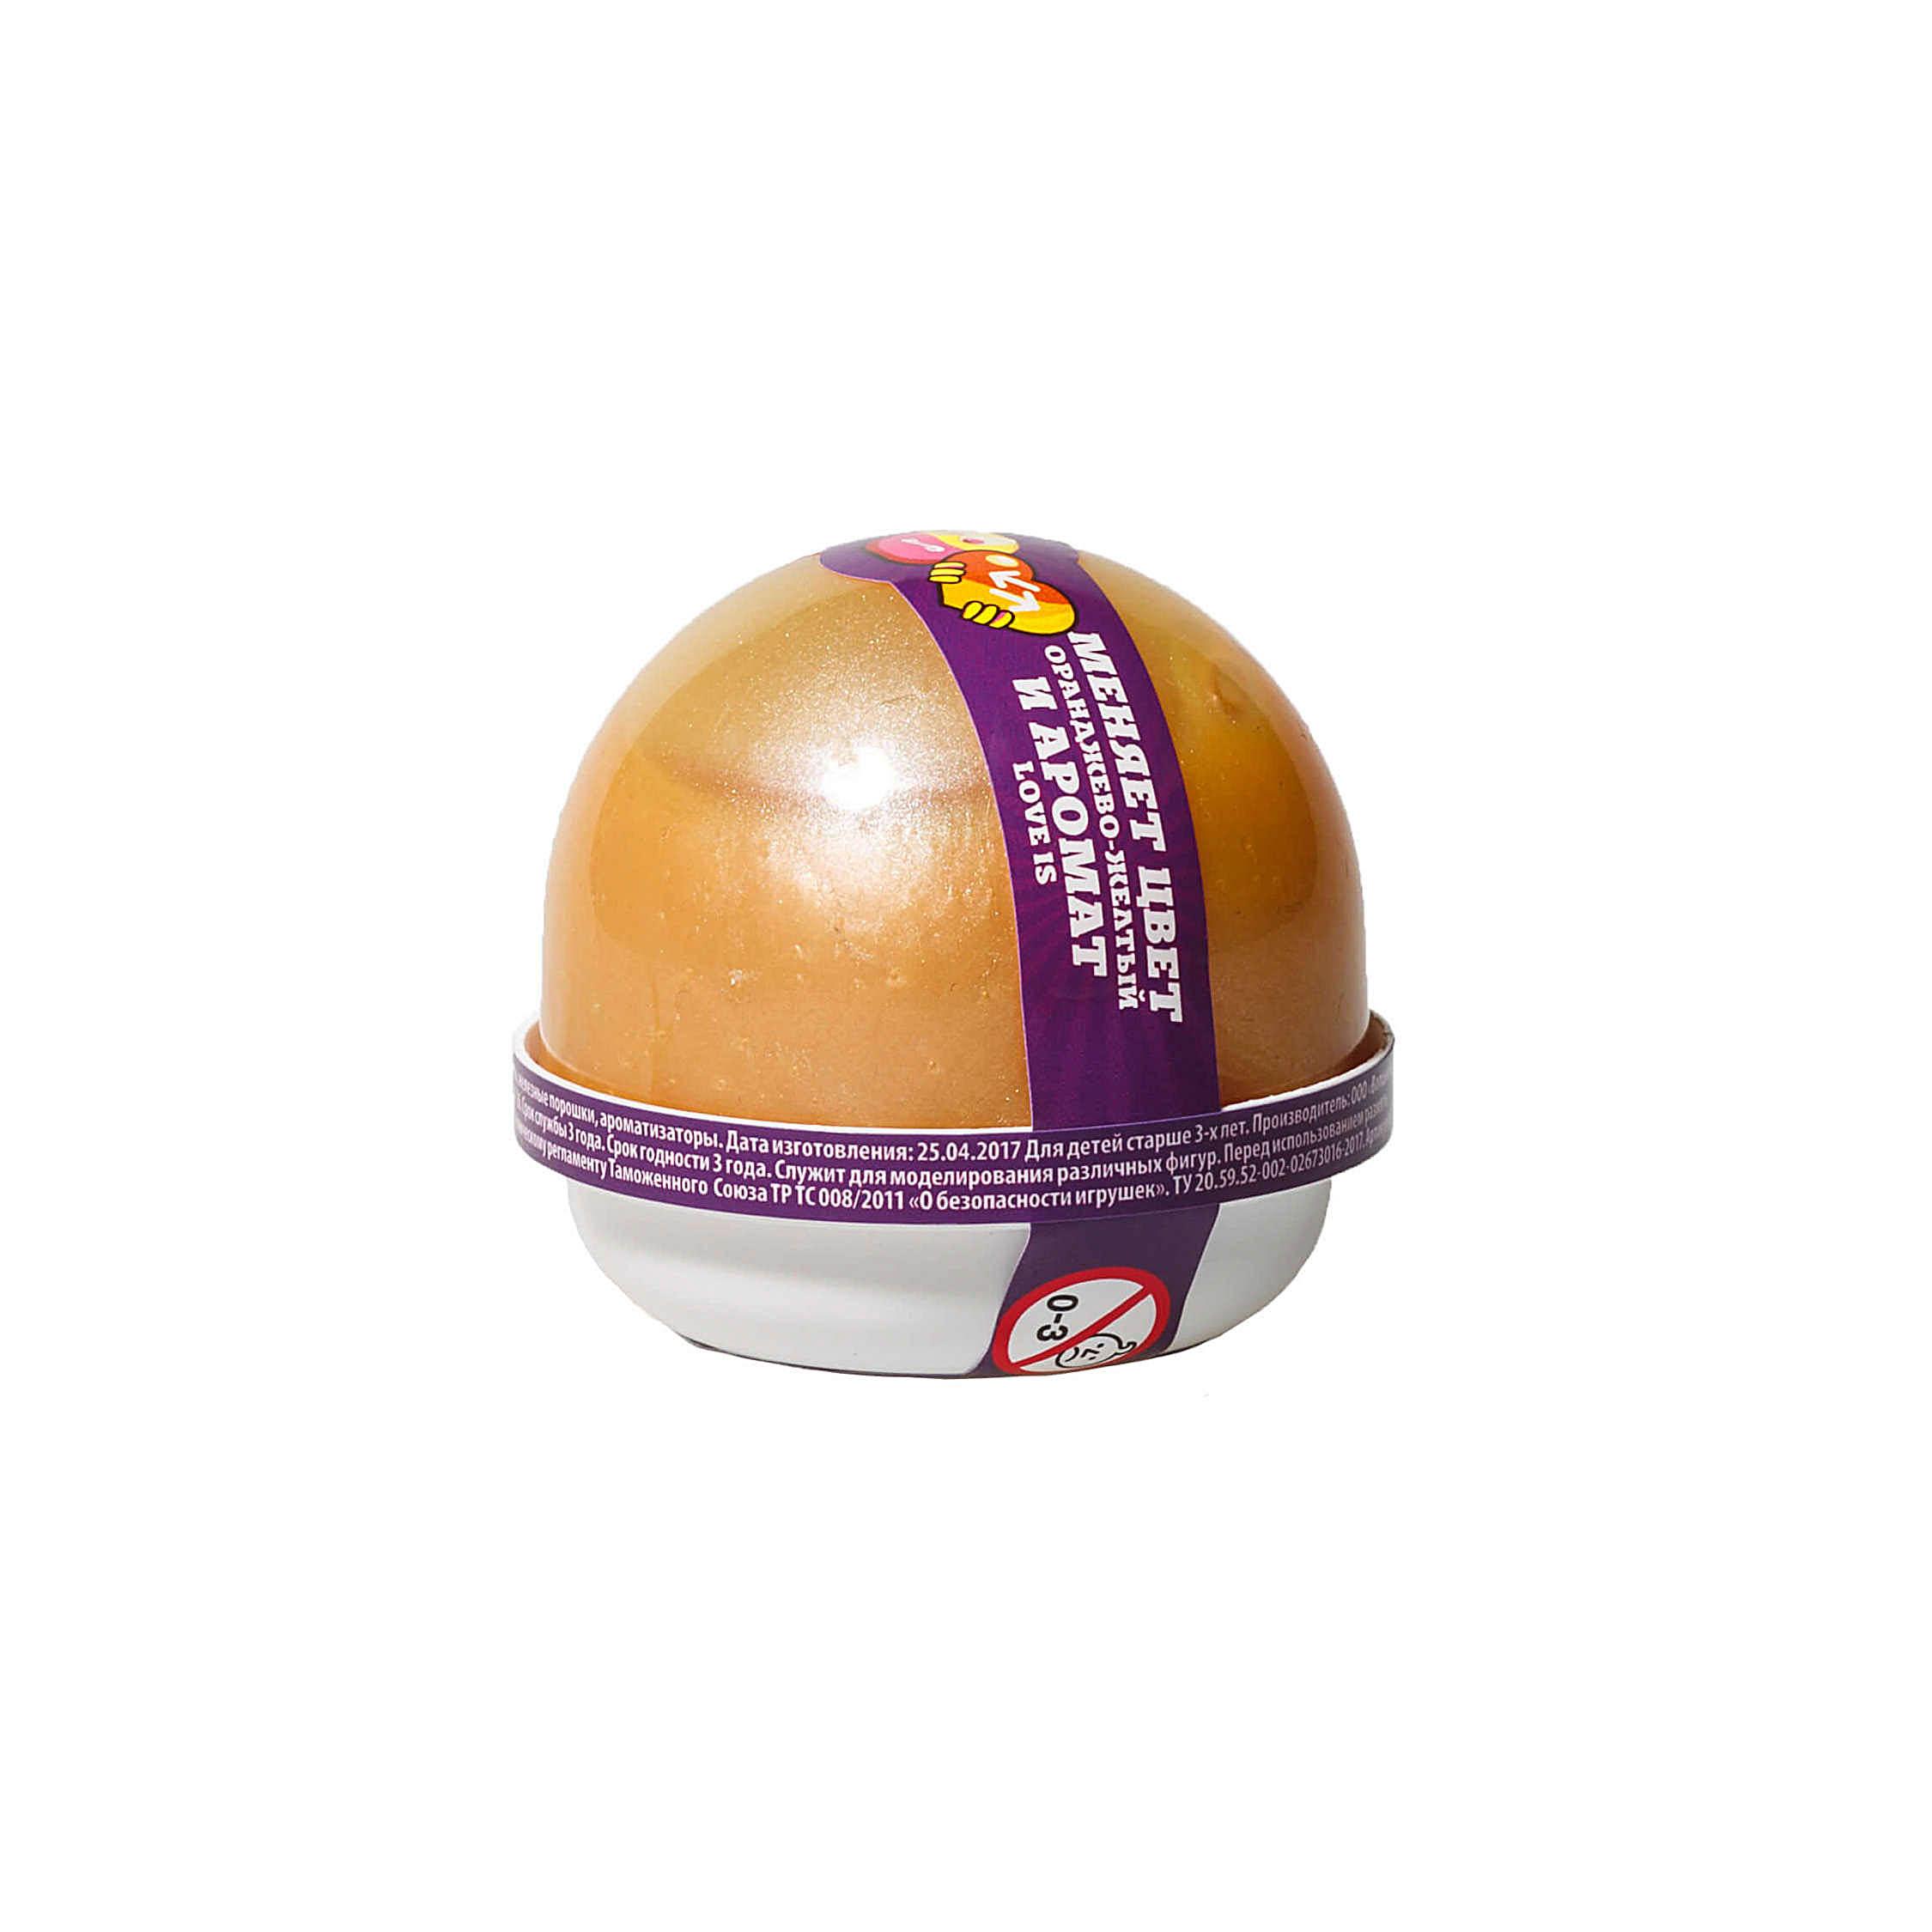 "NG2LI25 ""Жвачка для рук ""Nano gum"", оранжево-желтый с ароматом LOVE IS"", 25 гр."